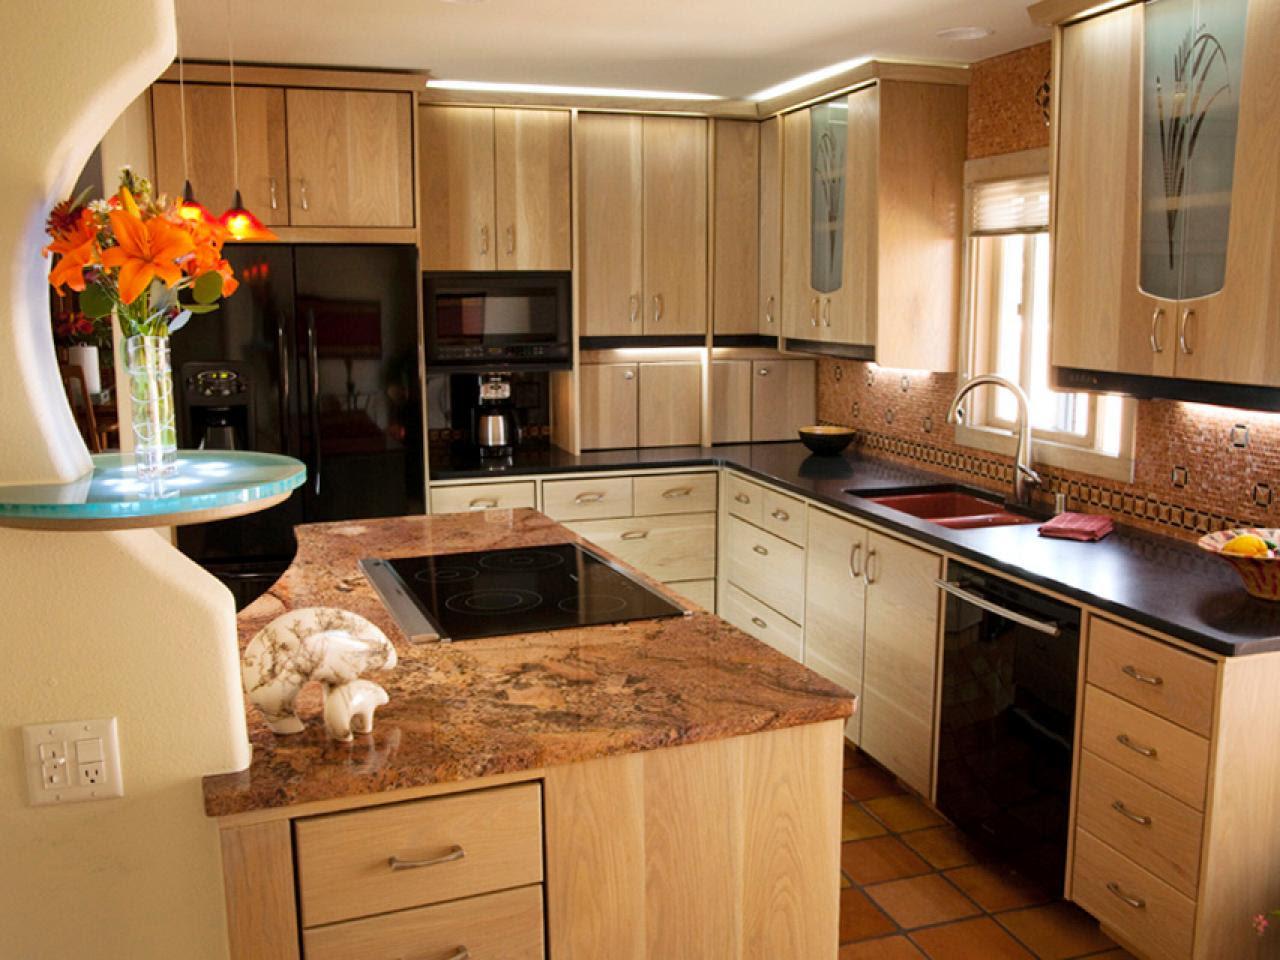 Granite Kitchen Countertops: Pictures